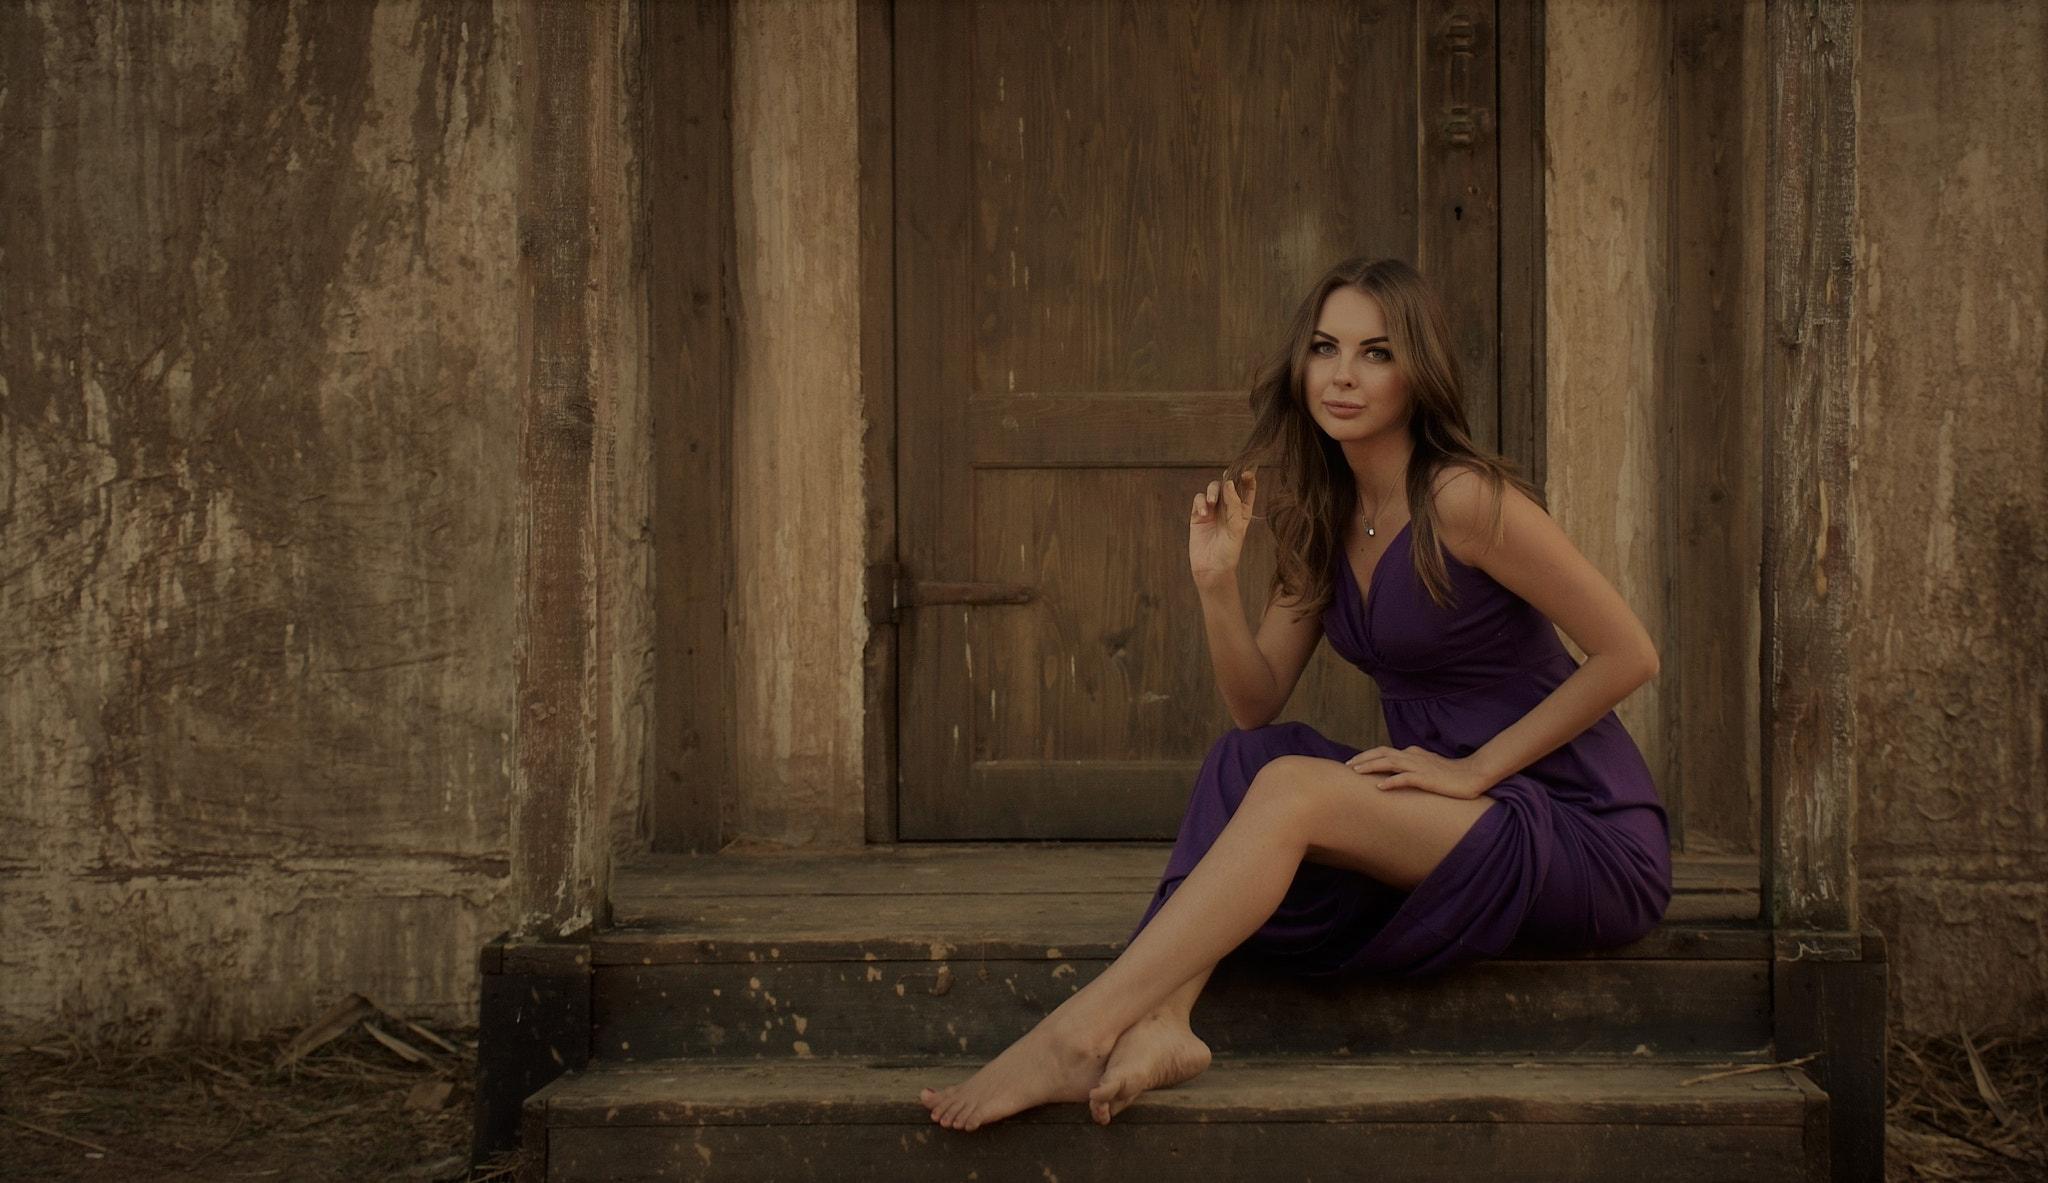 People 2048x1183 women purple dresses sitting brunette necklace door portrait women outdoors barefoot model looking at viewer long hair straight hair legs